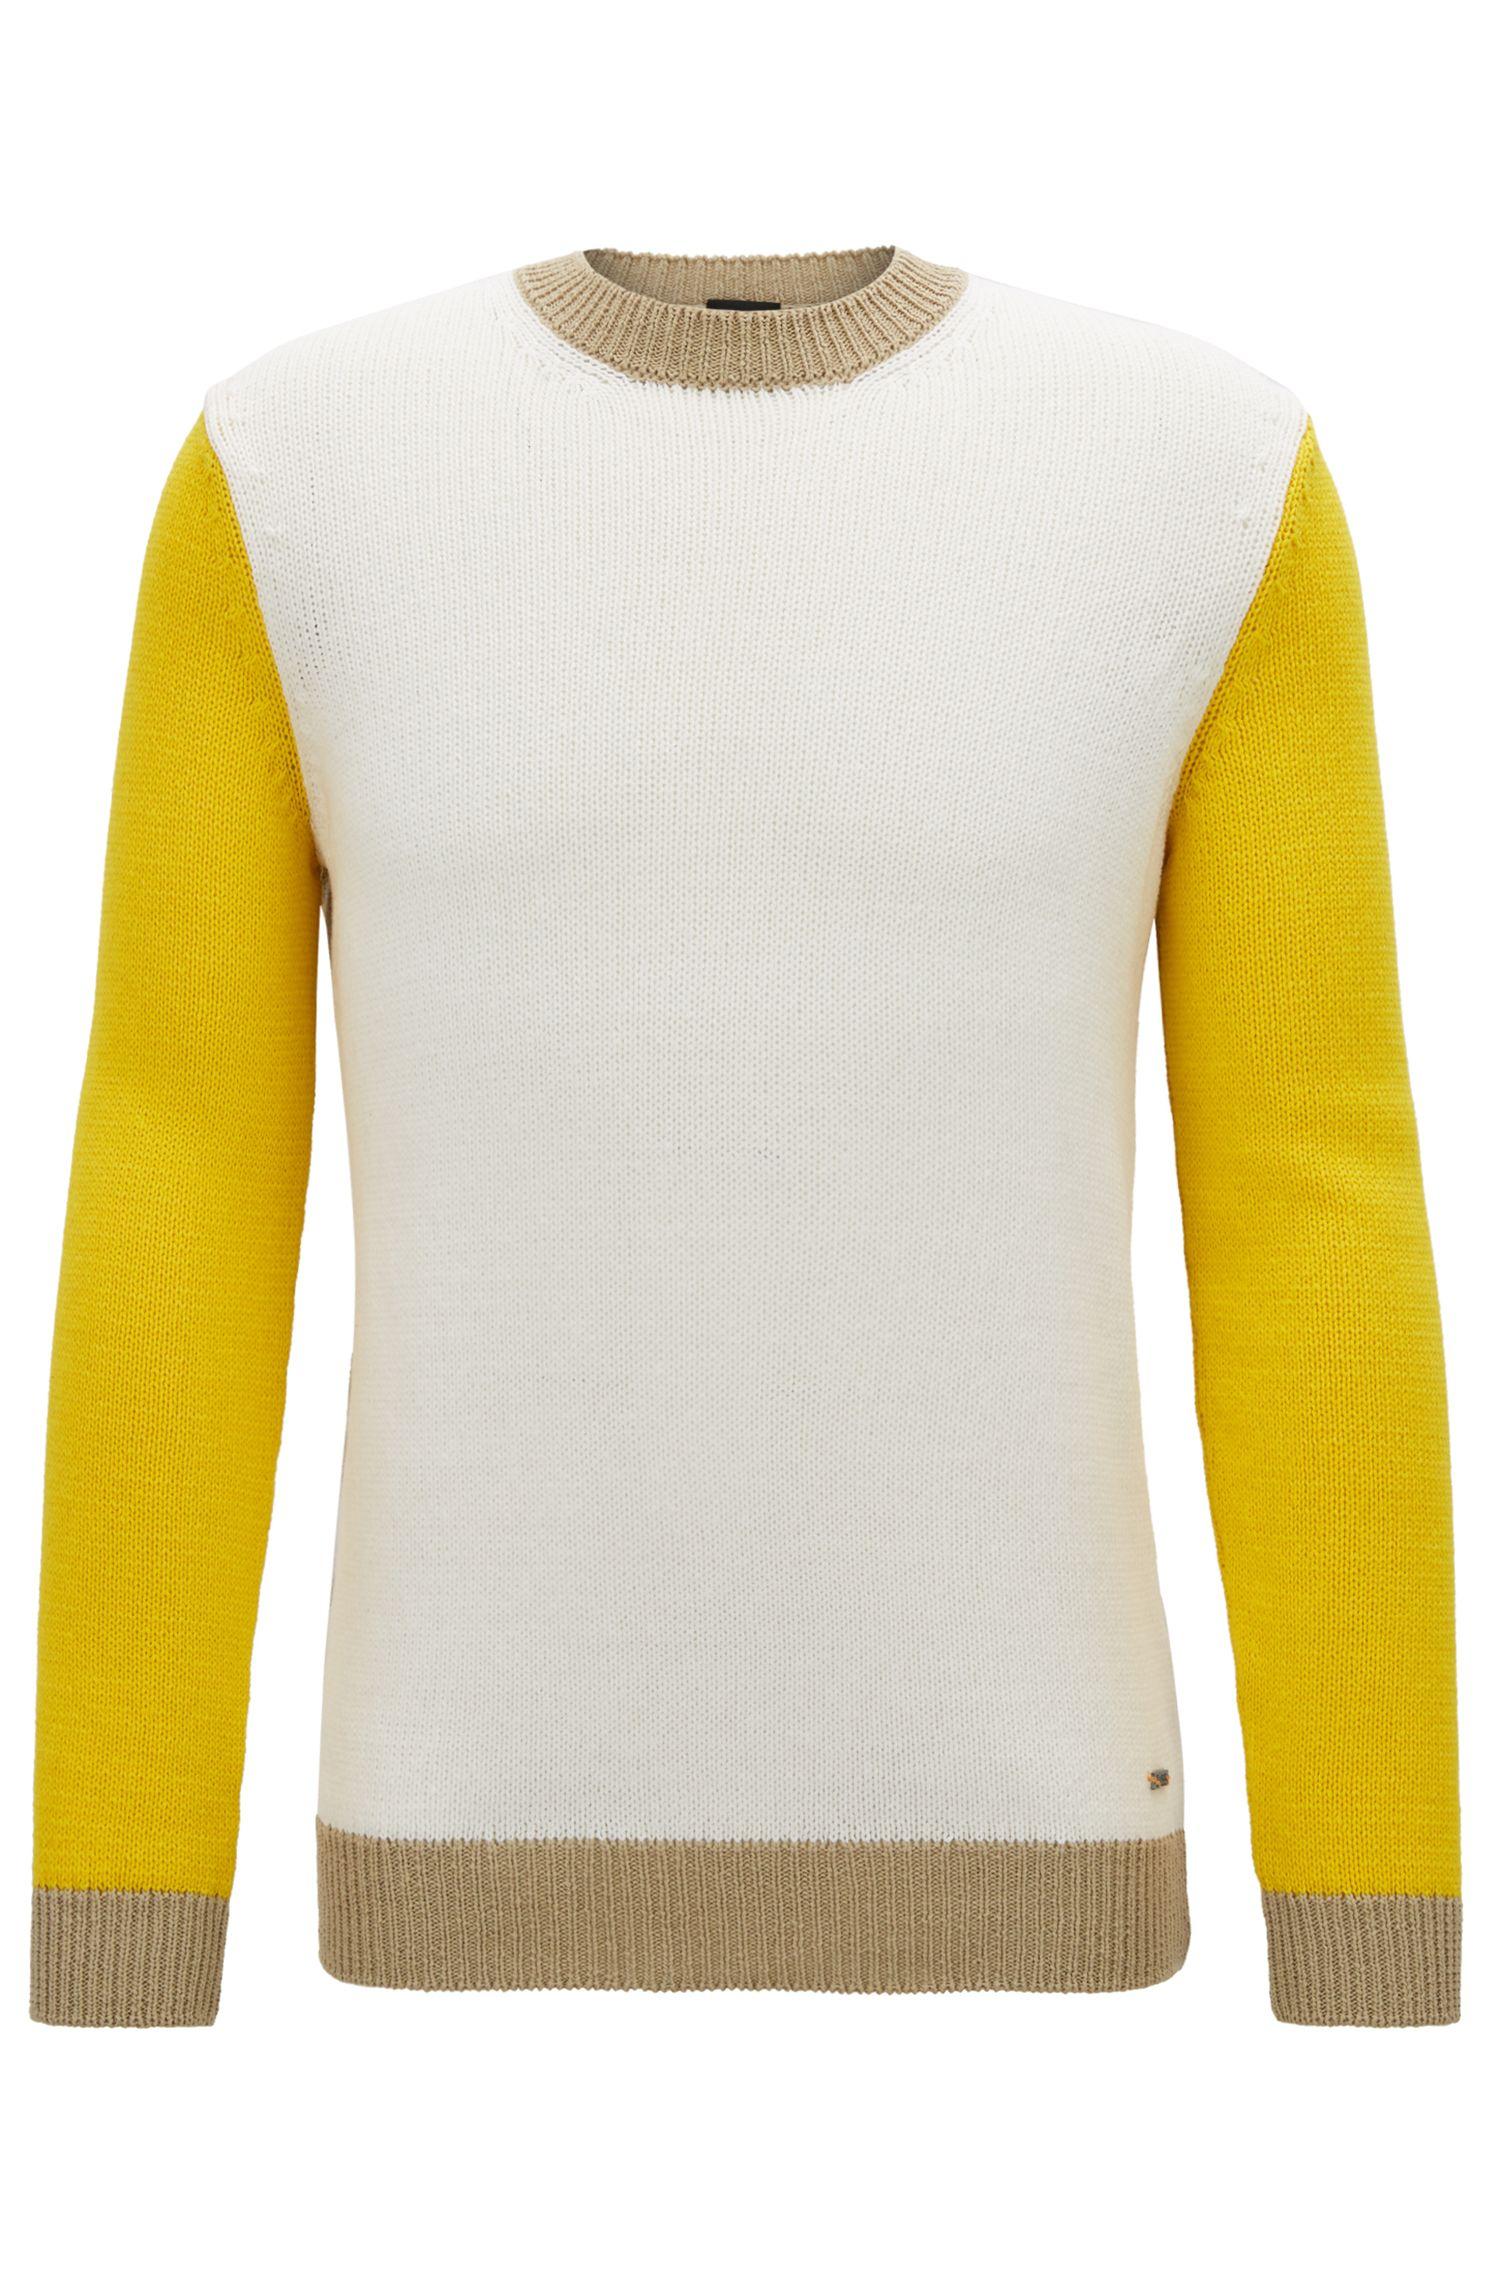 Colorblock crew-neck sweater in mercerized cotton